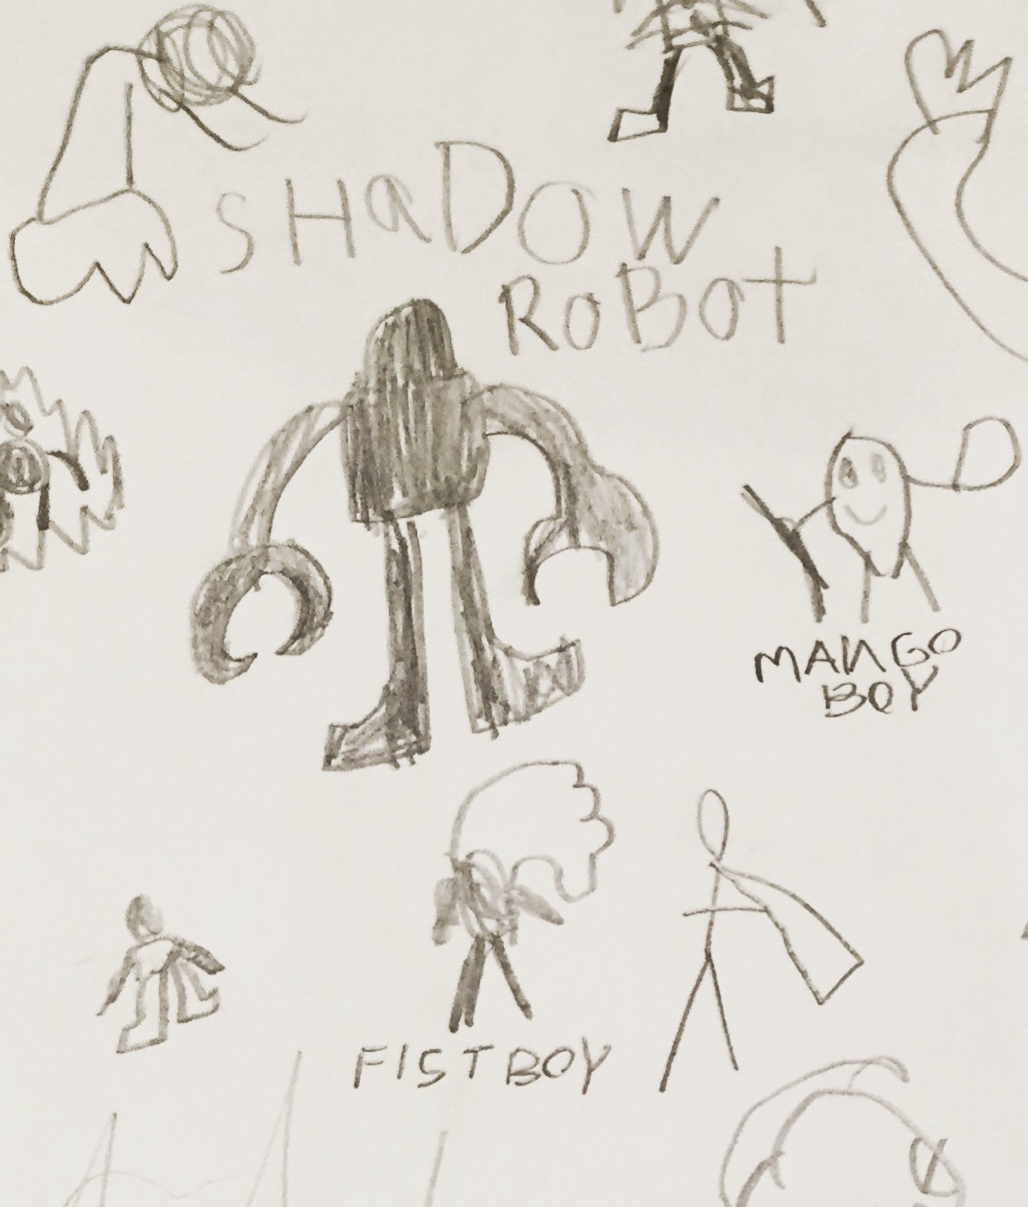 shadowrobot